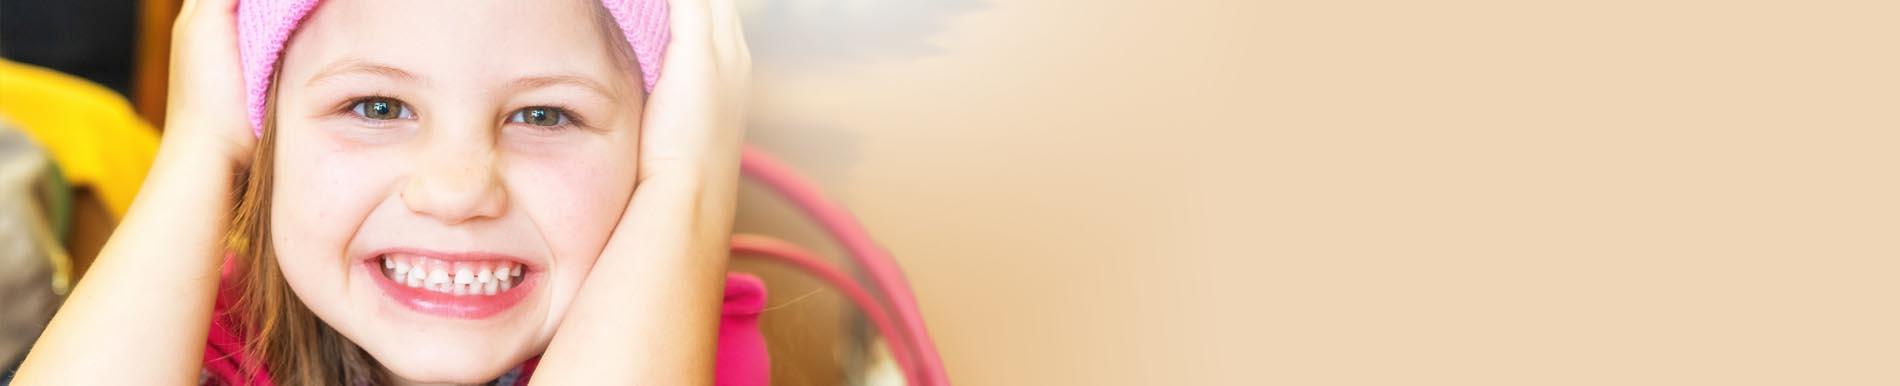 https://www.healthychildren.org/SiteCollectionImage-Homepage-Banners/epilepsy_head_girl_teeth_banner.jpg